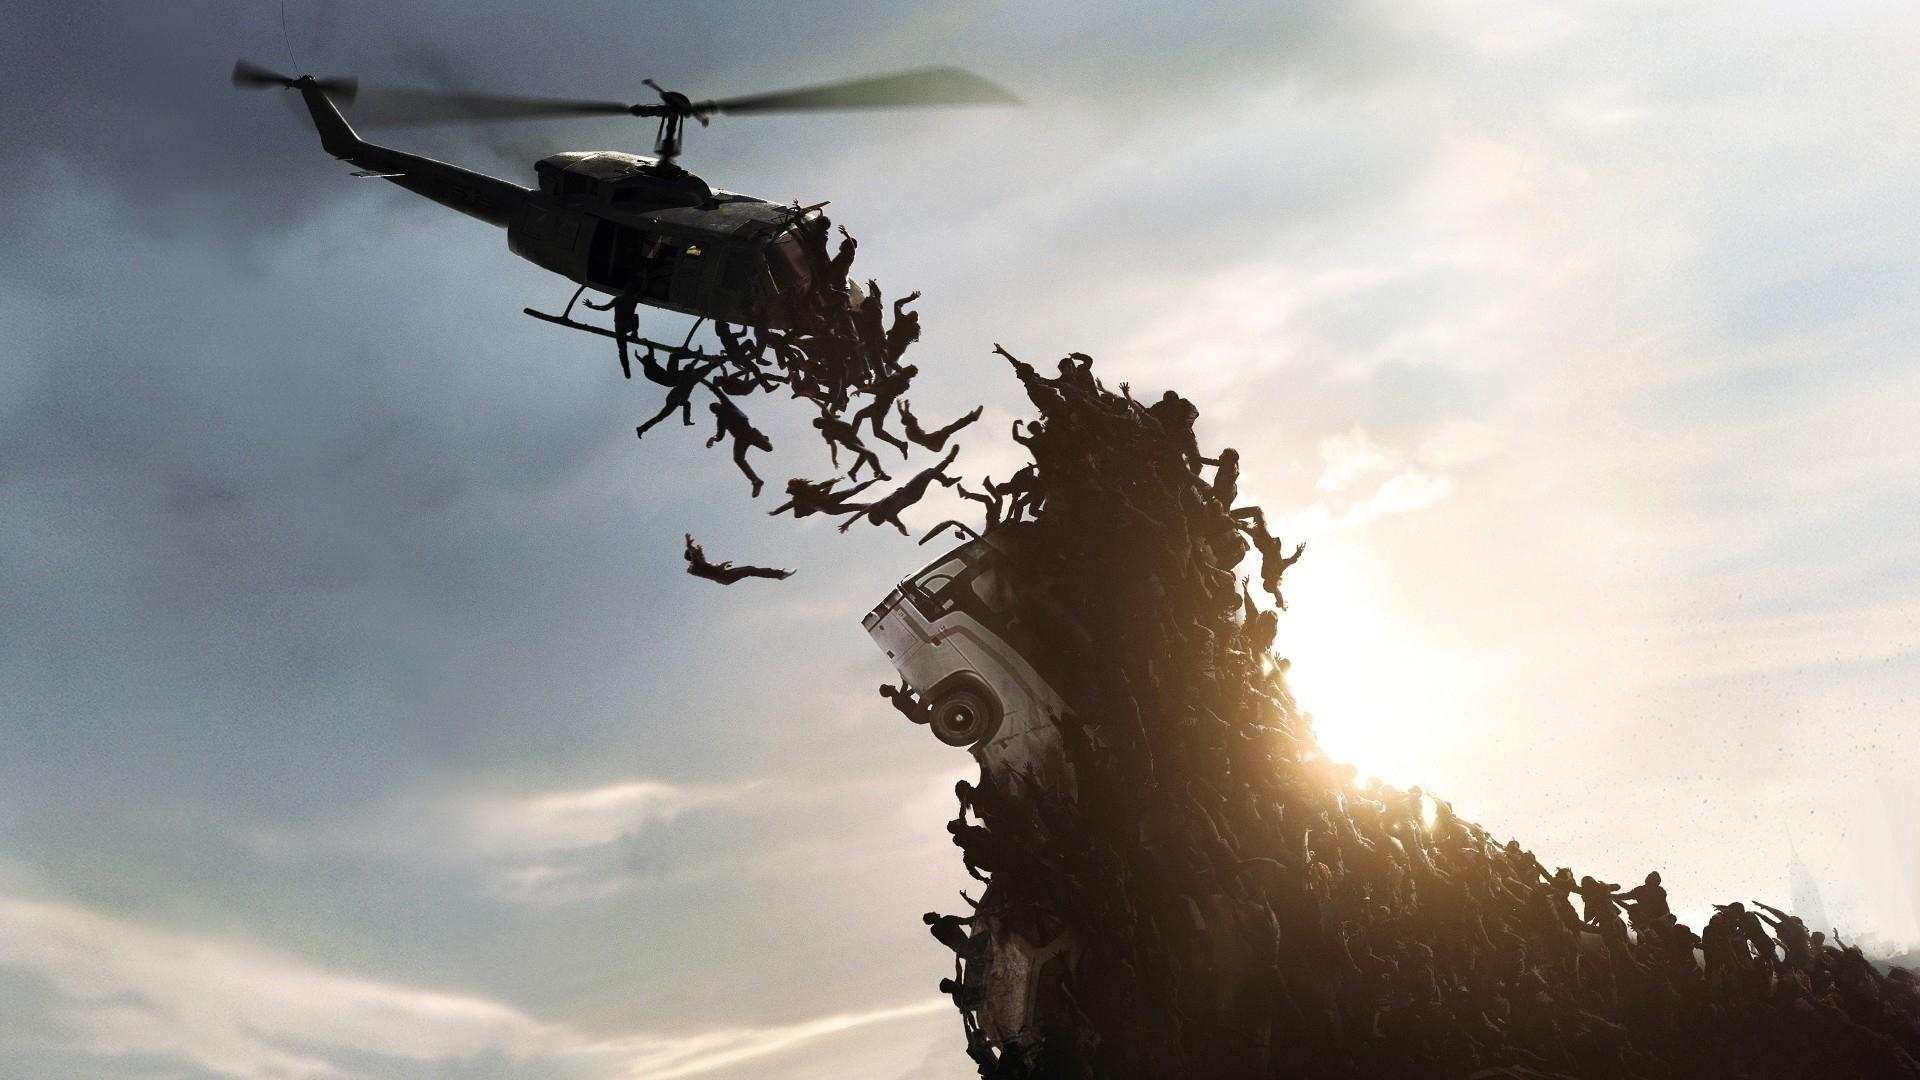 monde war z tomber ciel apocalypse zombie papier peint